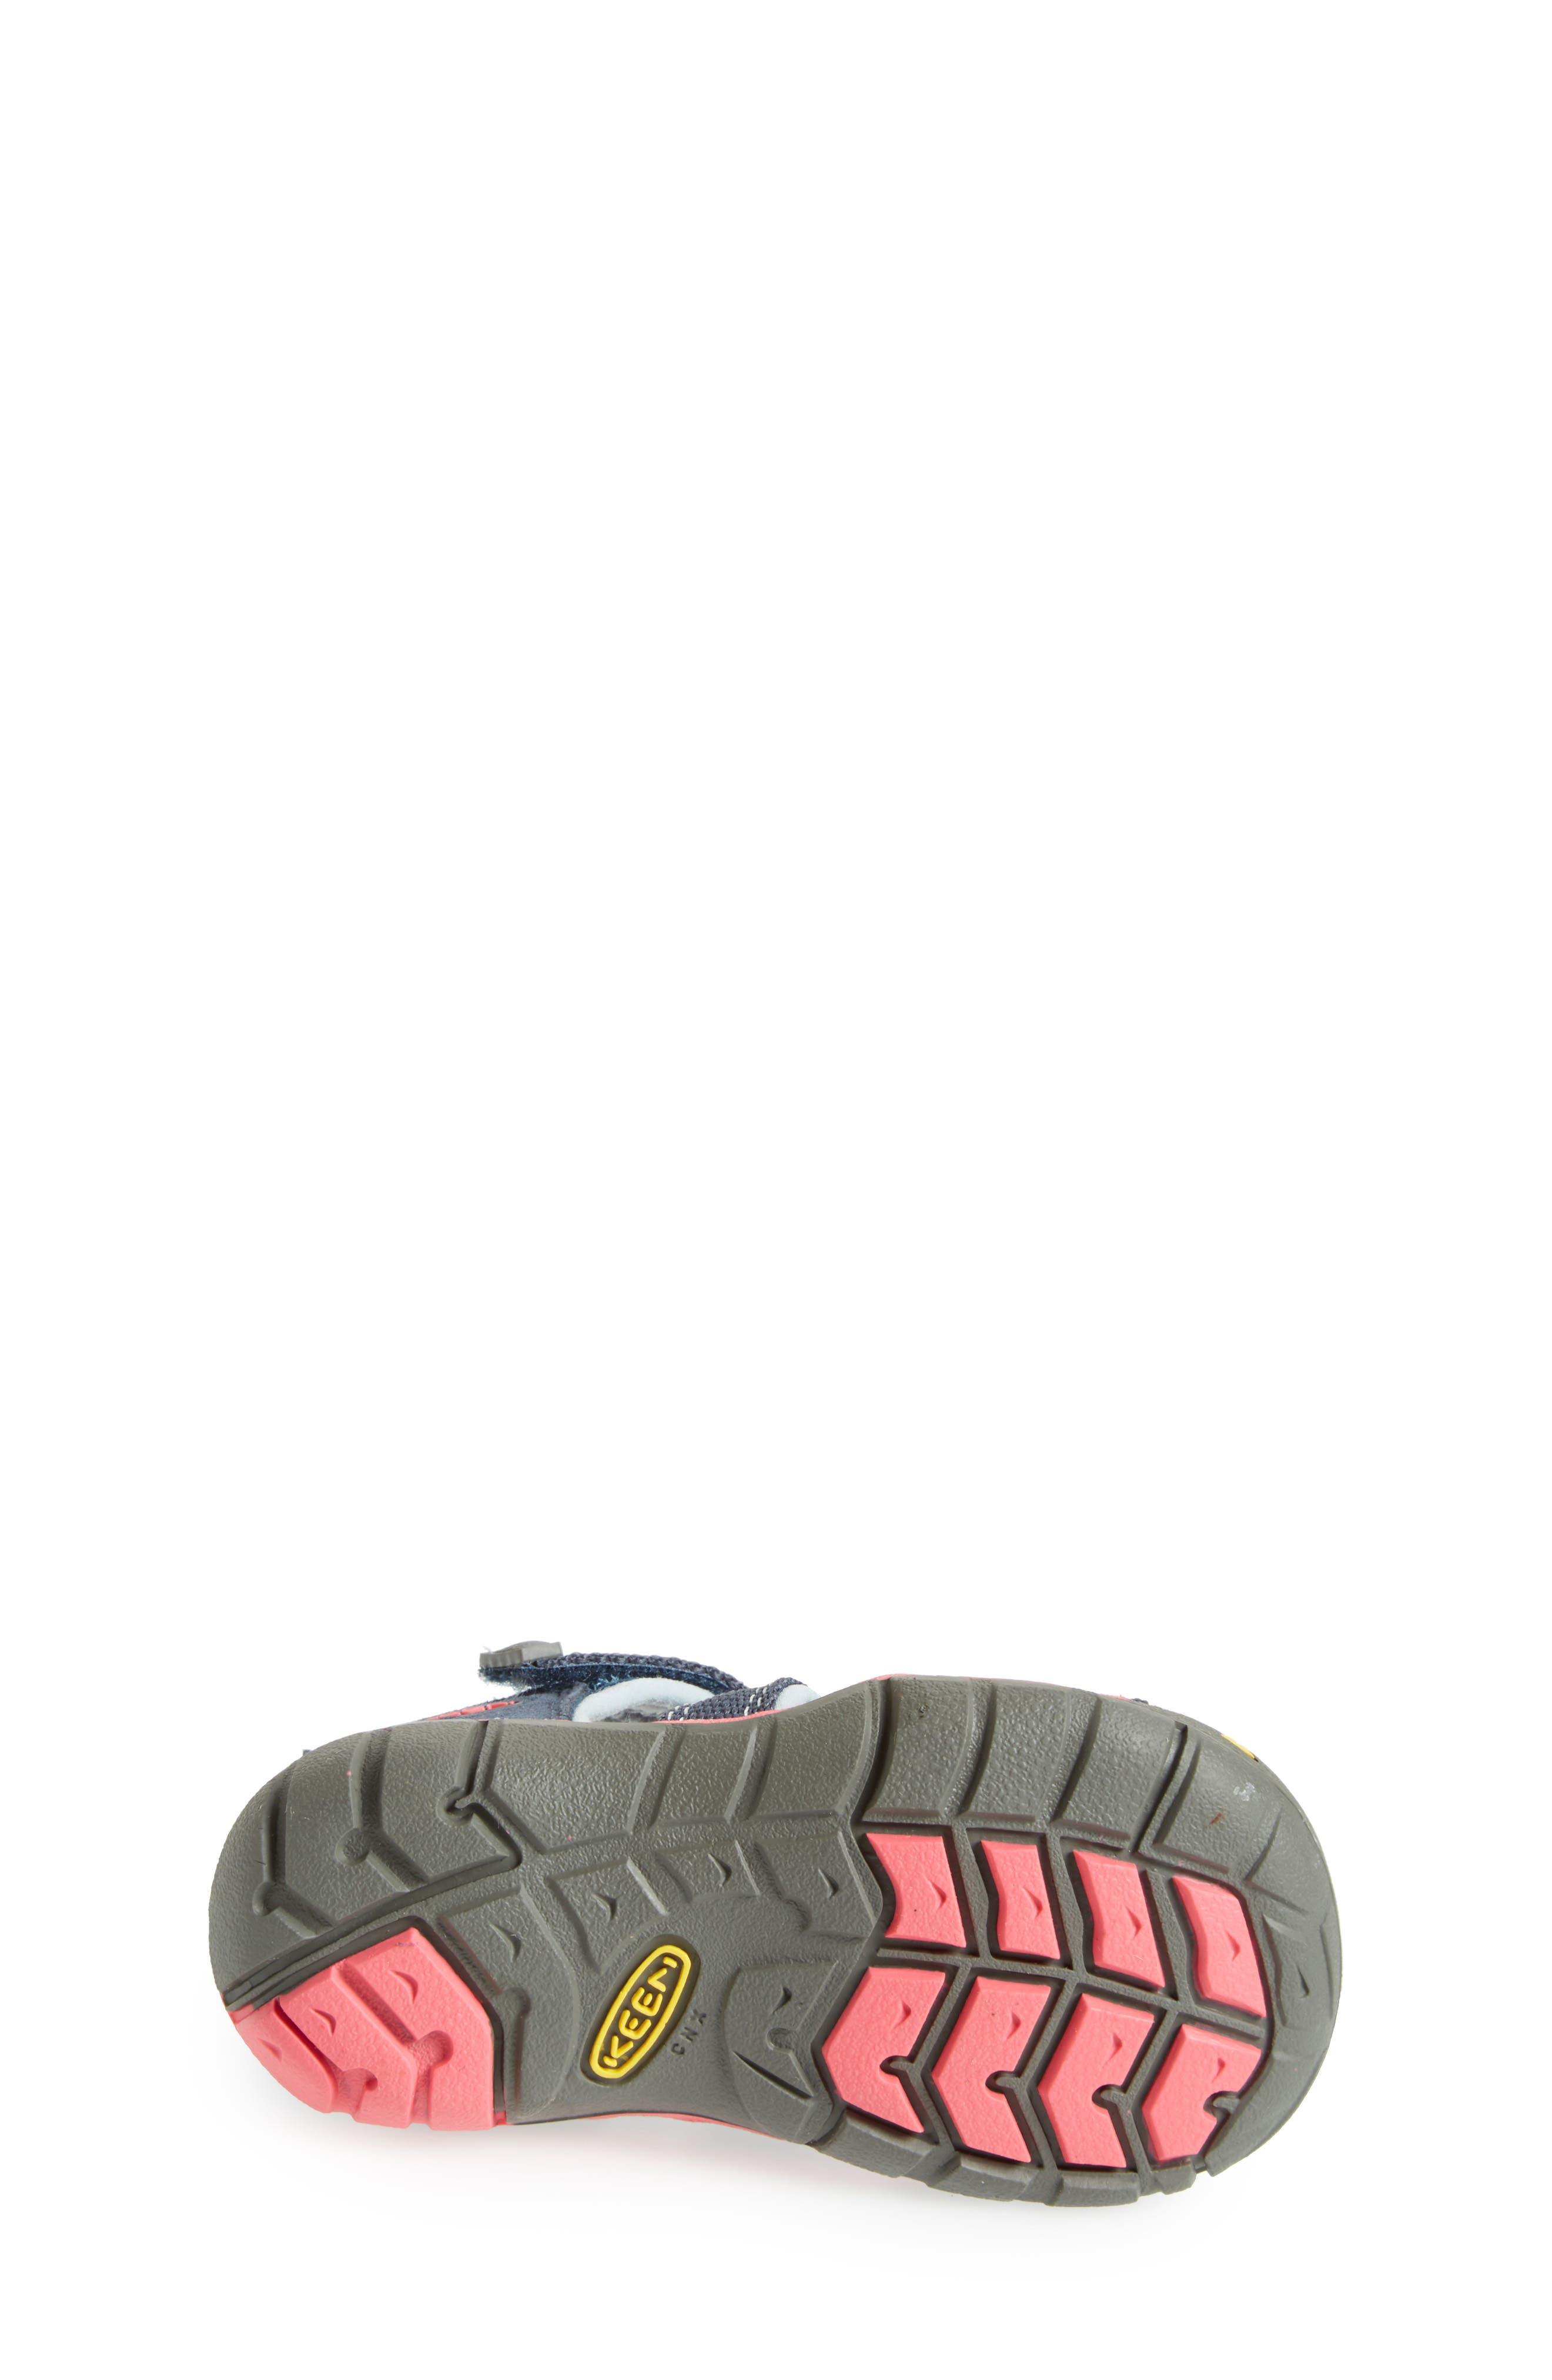 ,                             'Seacamp II' Water Friendly Sandal,                             Alternate thumbnail 190, color,                             420